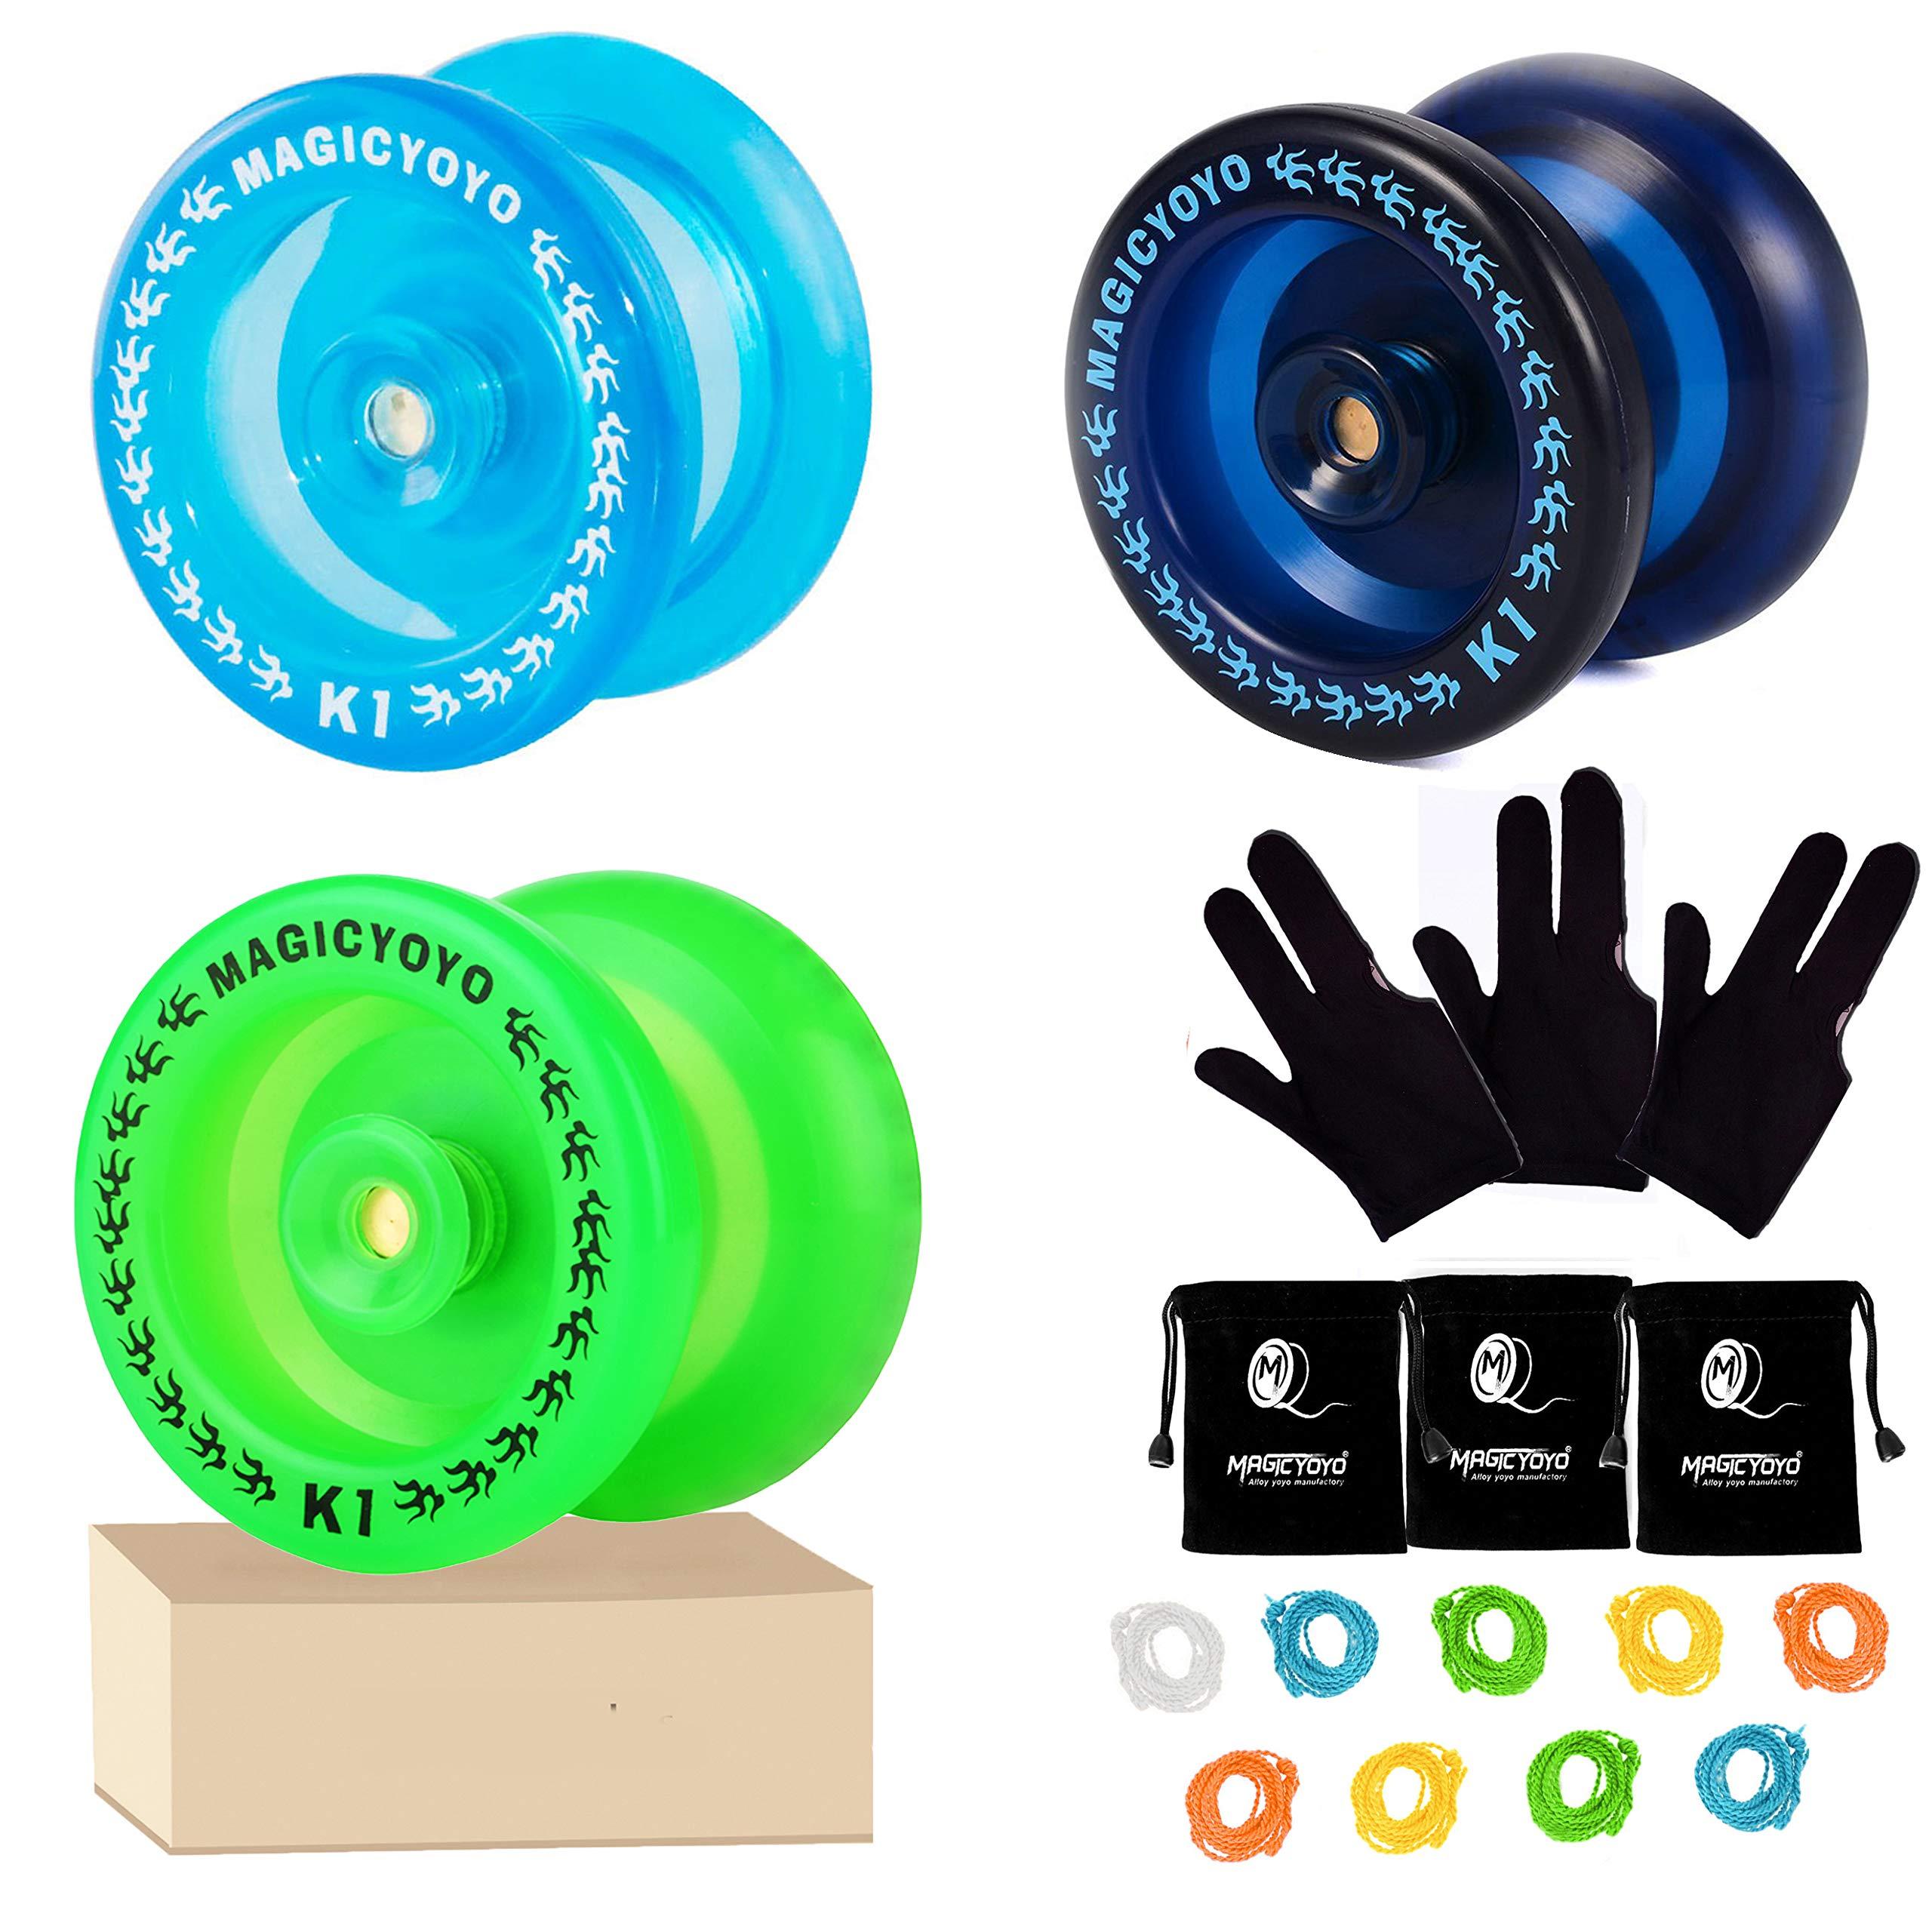 MAGICYOYO Pack of 3 Beginner Yoyos for Kids, K1-Plus Responsive YoYos with 3 Yoyo Gloves, 3 Yoyo Bags, 9 Strings, All in A Gift Box